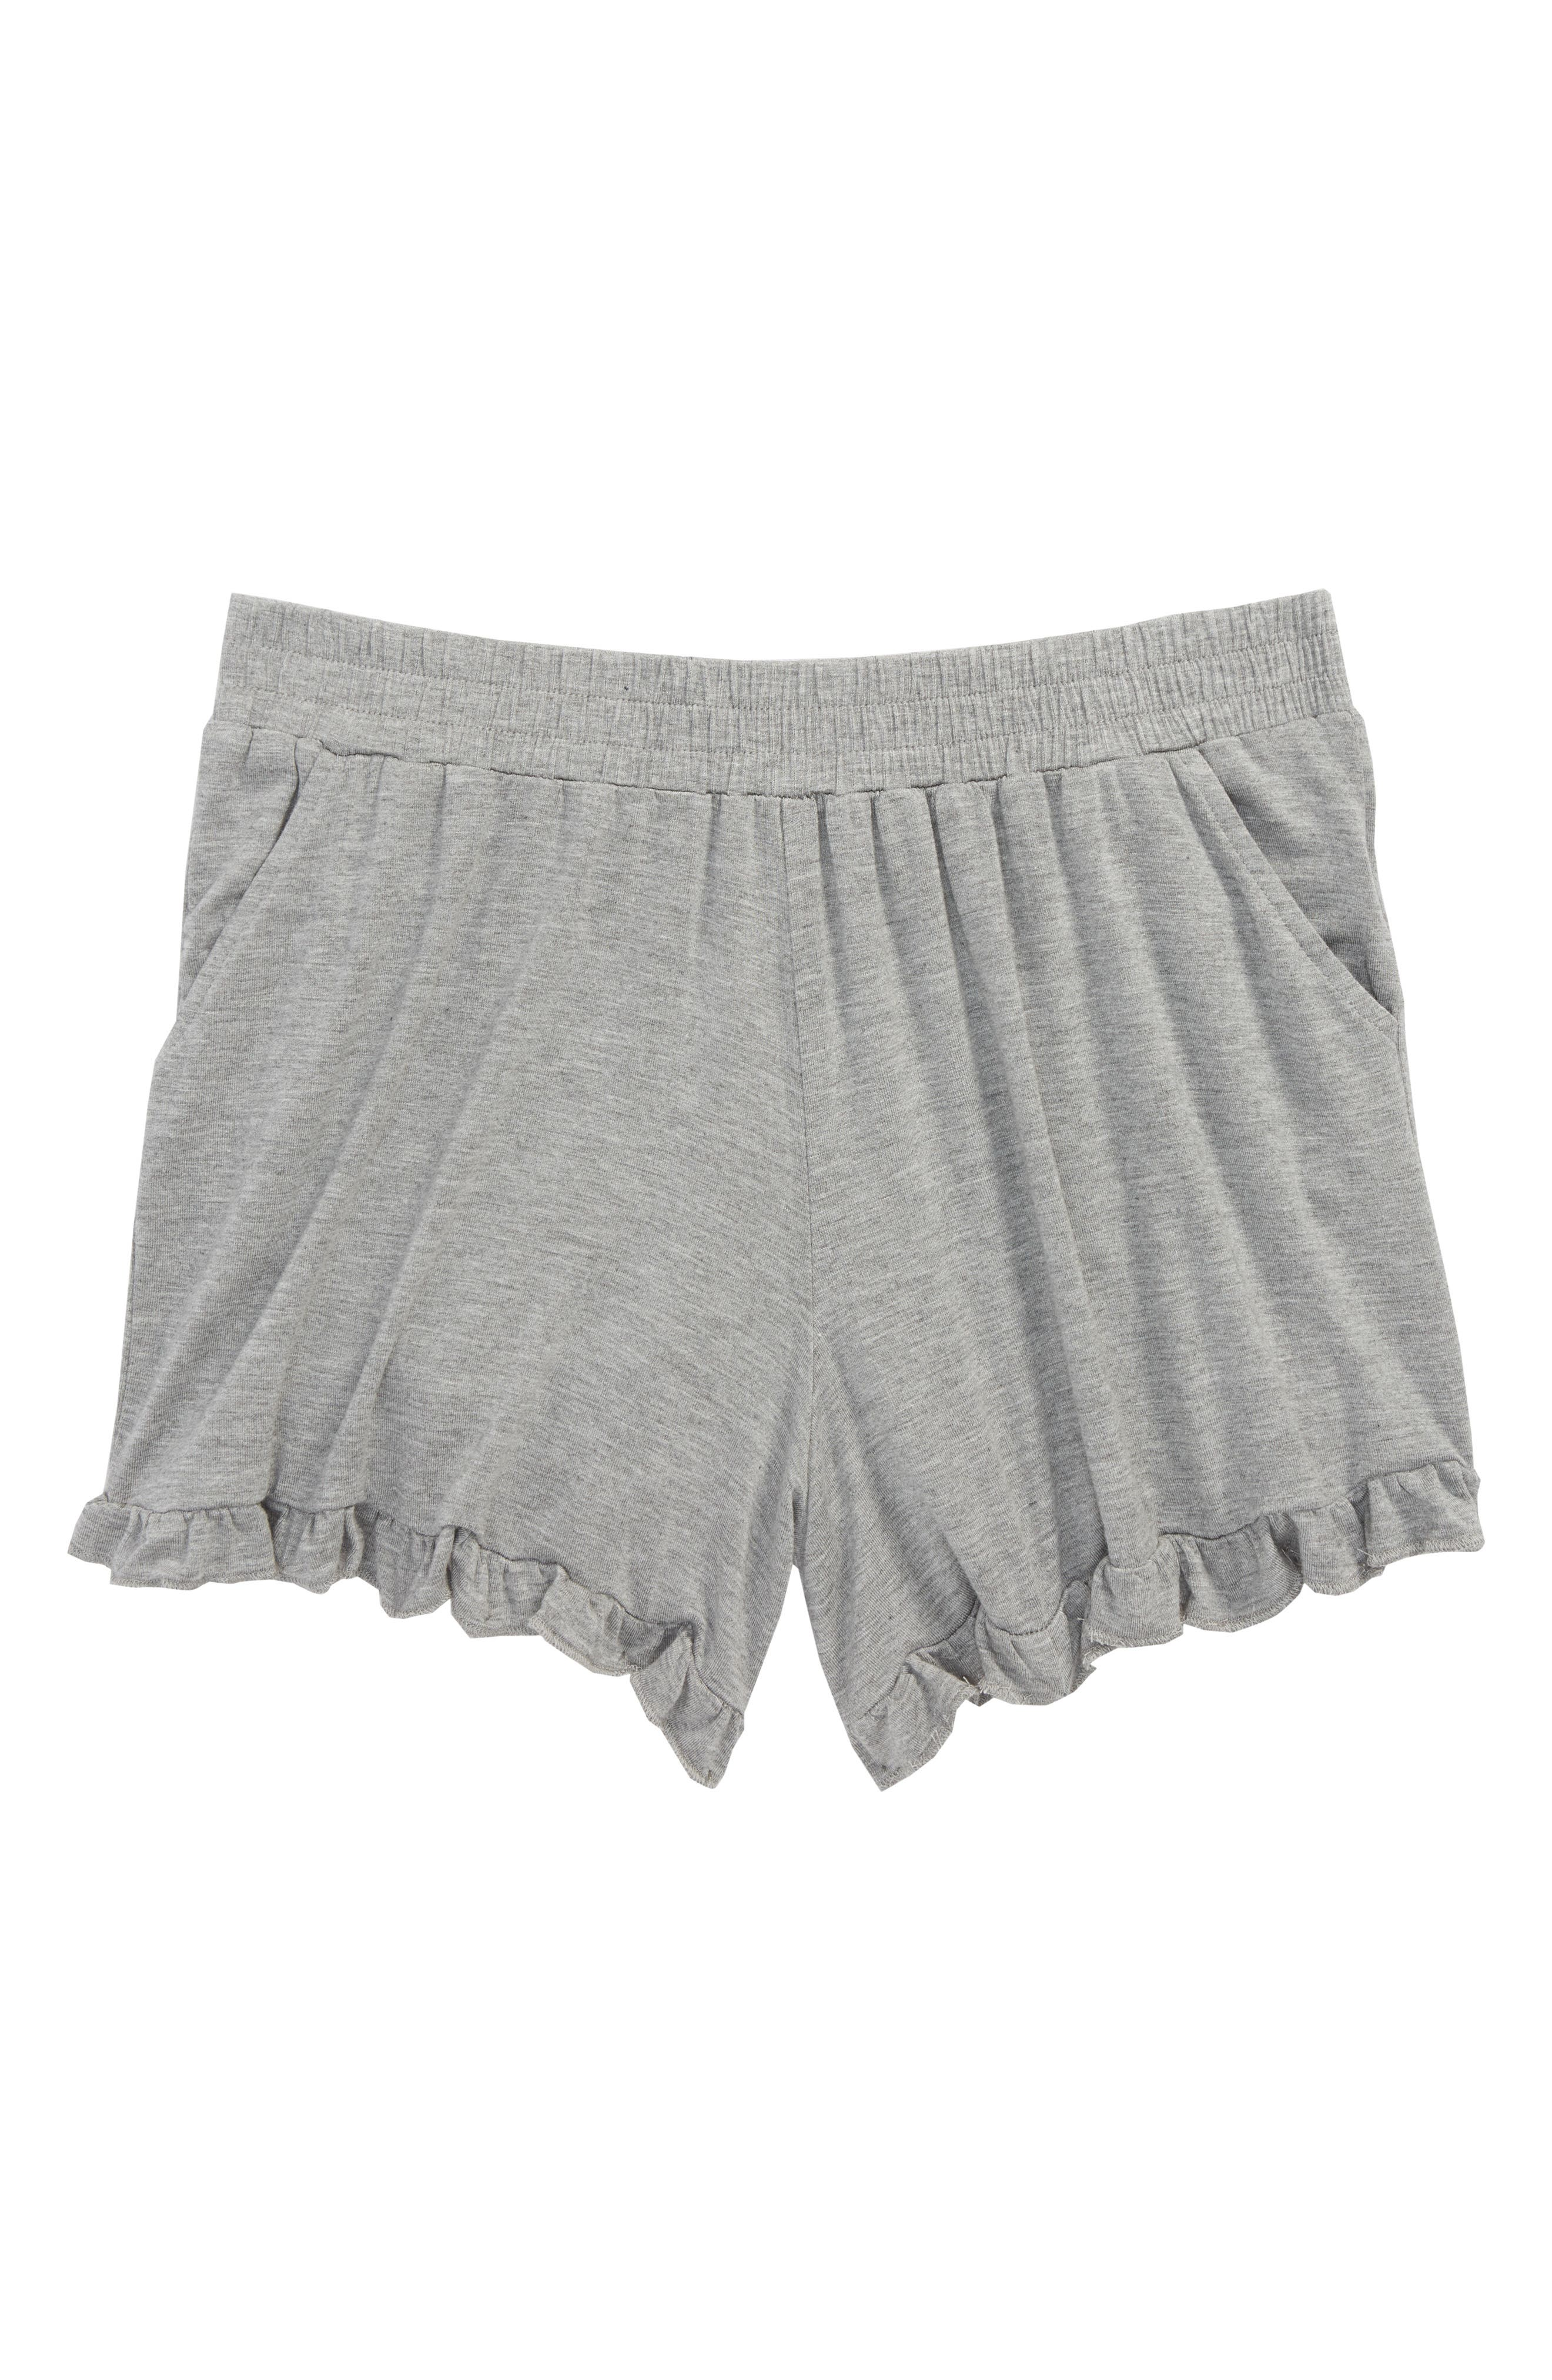 Ruffle Shorts,                             Main thumbnail 1, color,                             Grey Medium Heather